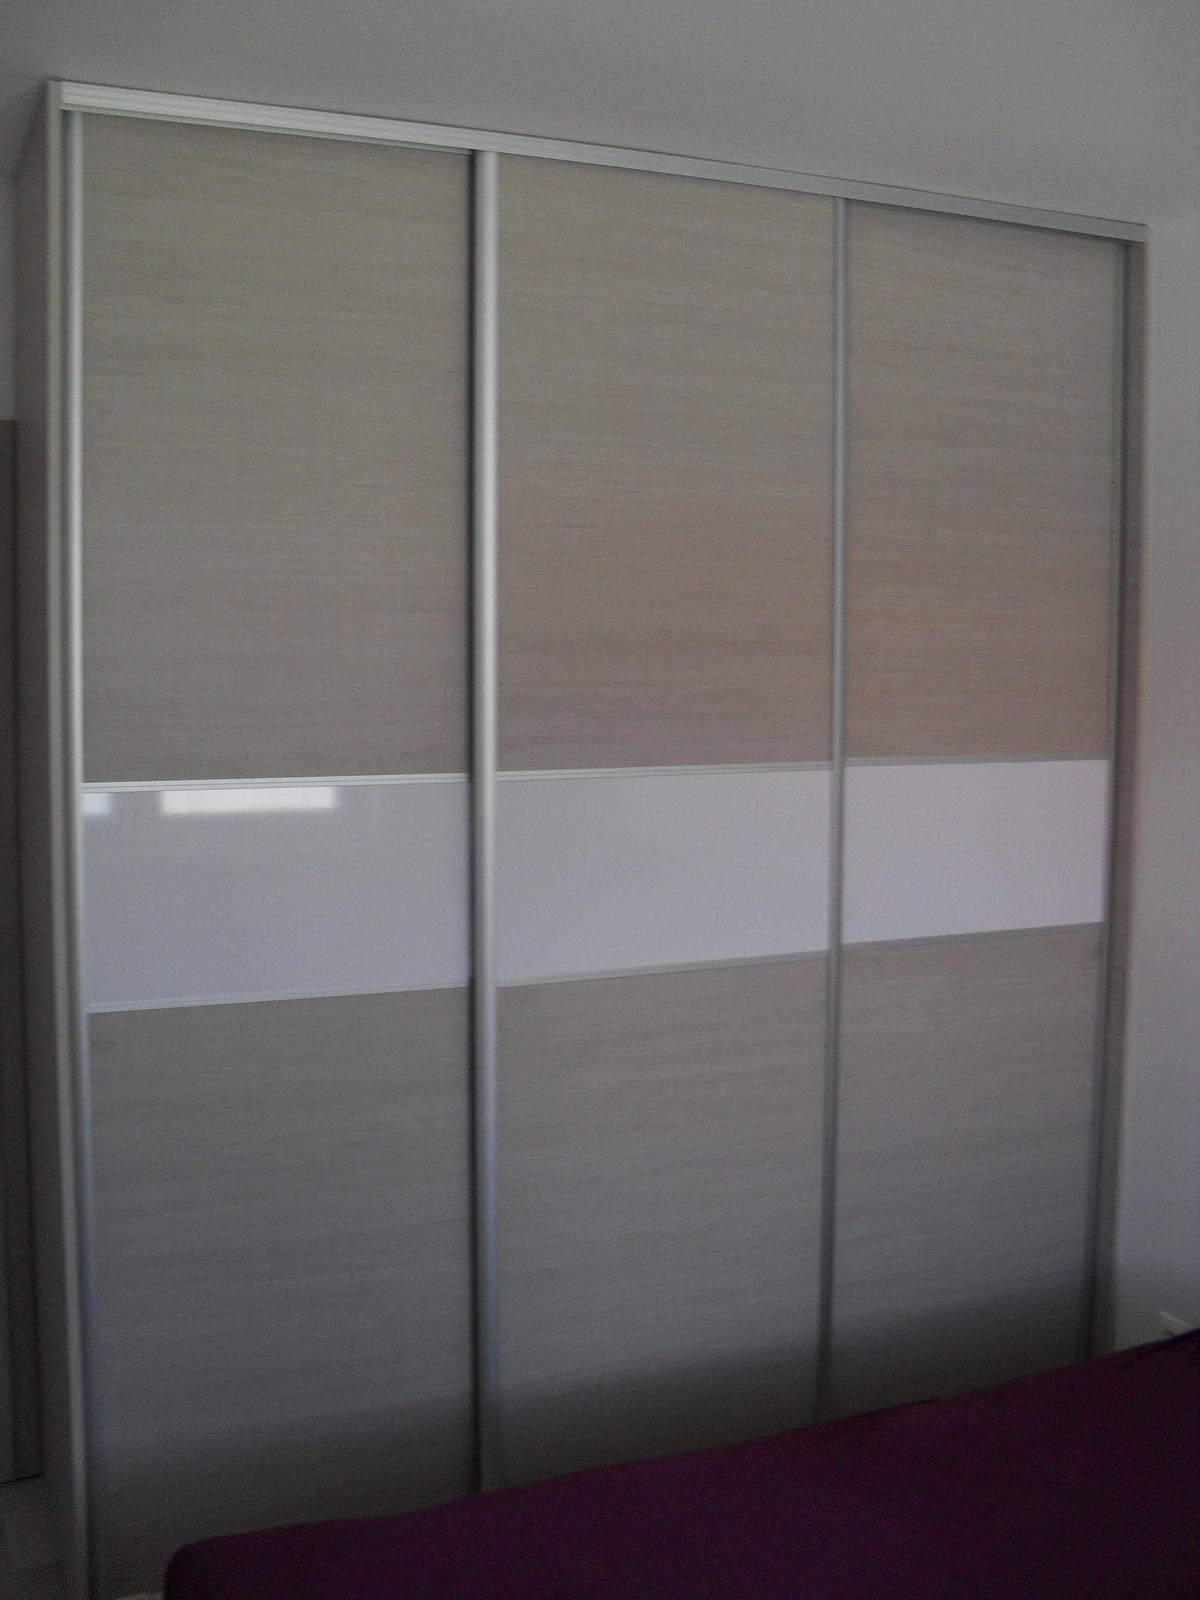 Vstavané skrine Martin Benko Bošany - Obrázok č. 59